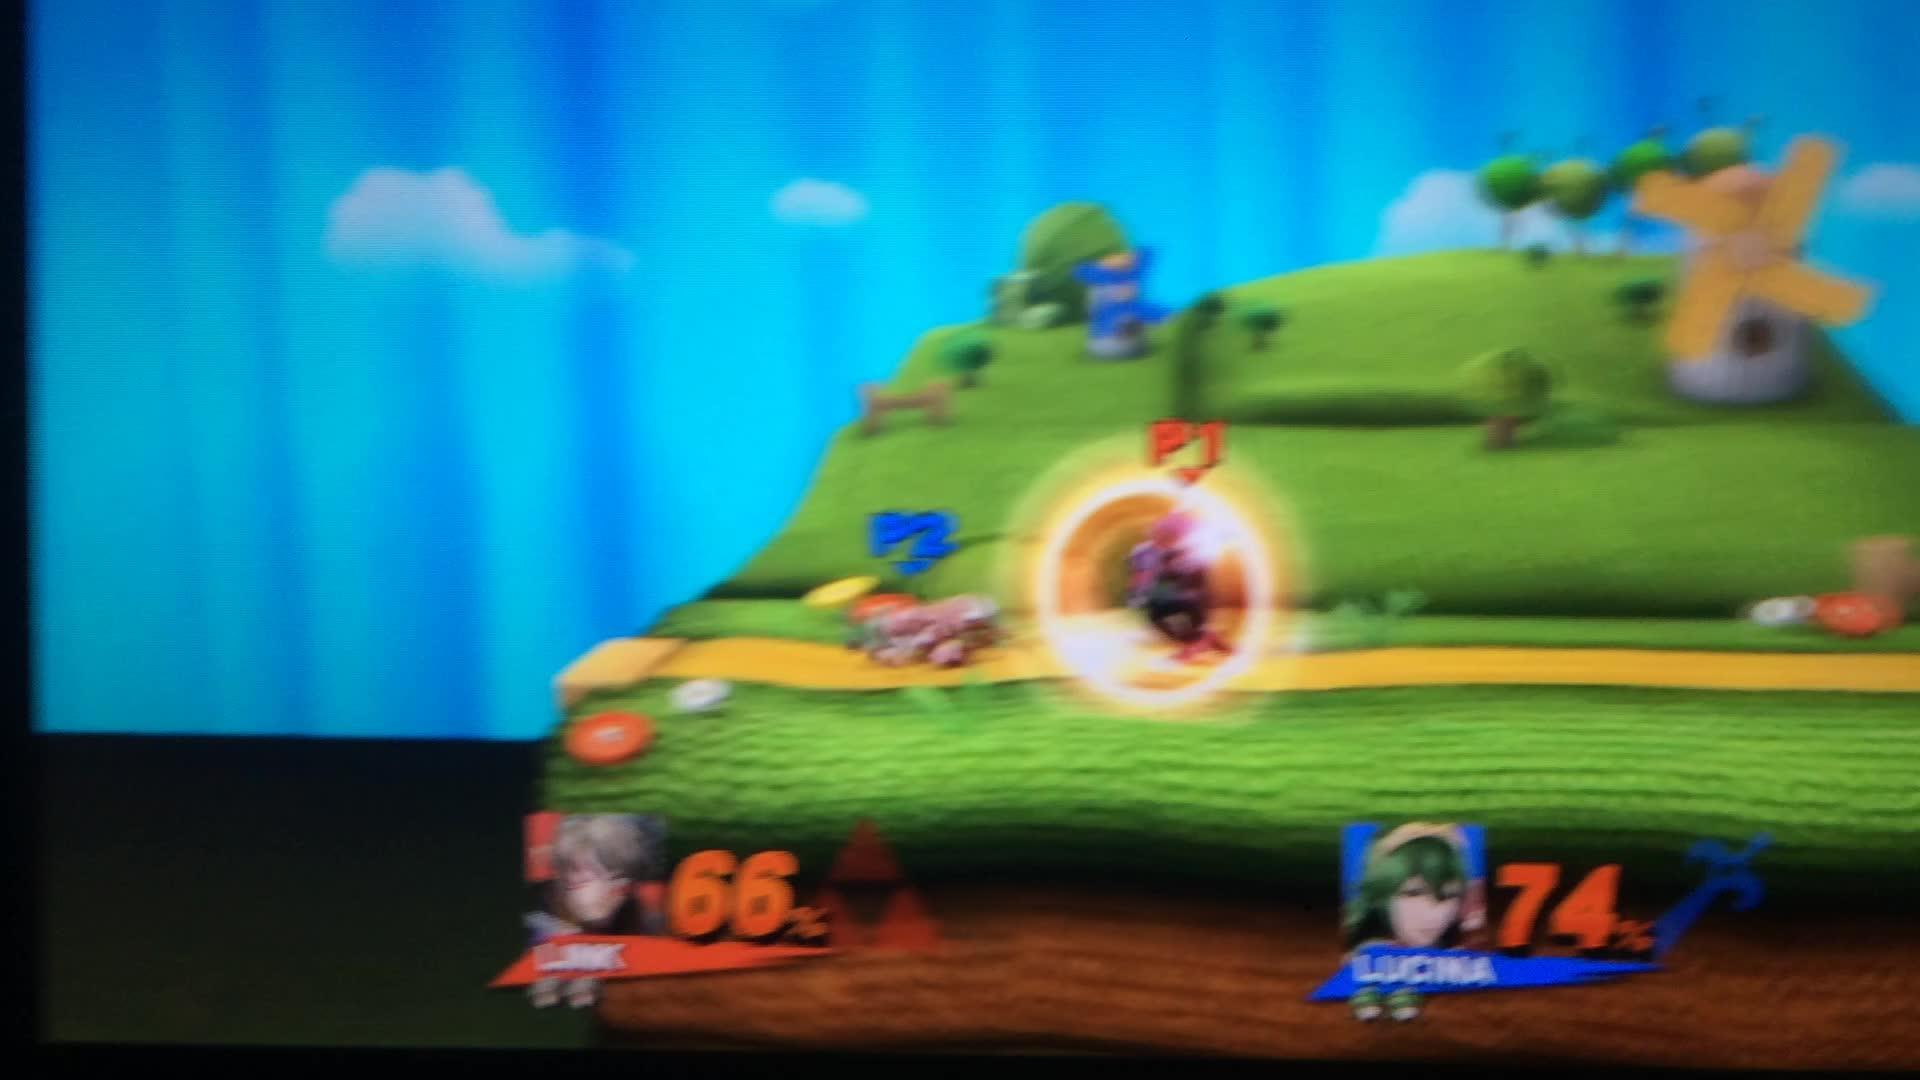 smashbros, Bomb Spike GIFs